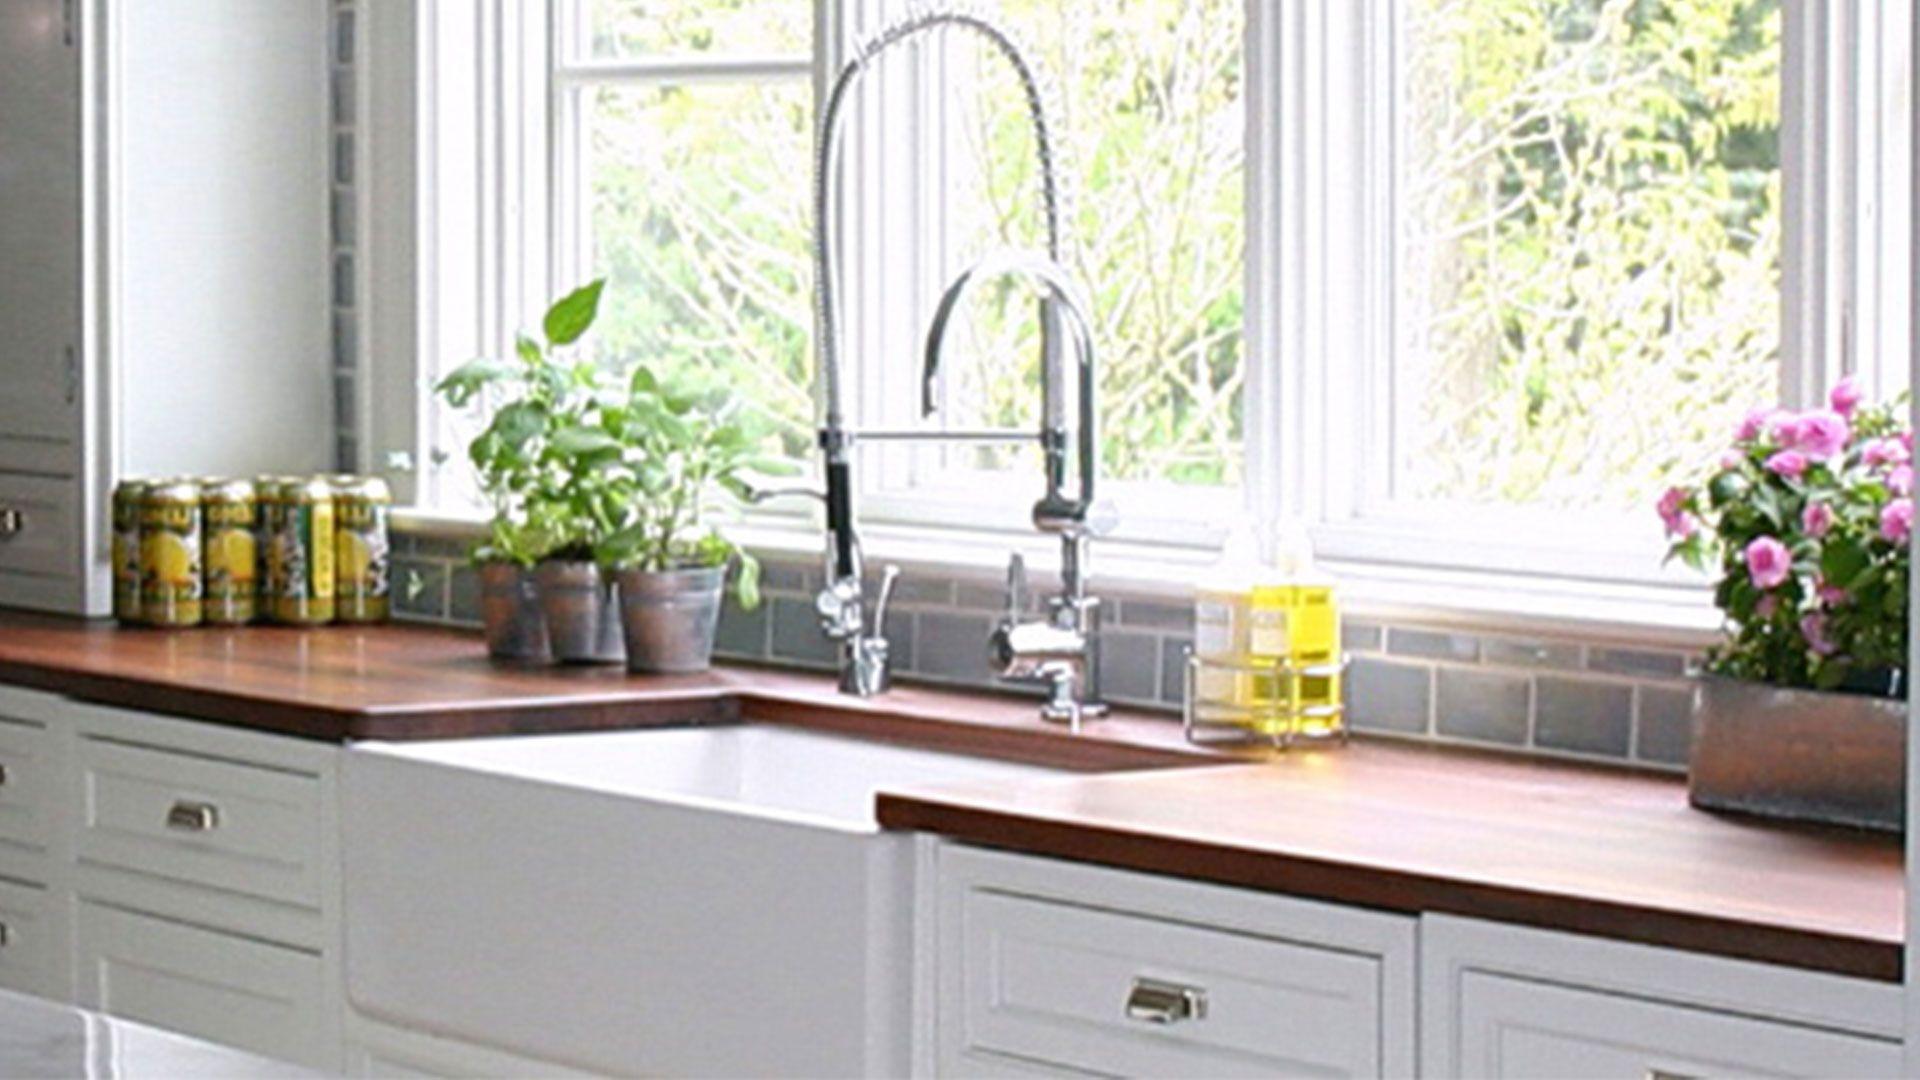 Sink kitchen looks for 2014   Home » Modern Kitchen » Design Trends for Kitchen 2014 Ideastodecor